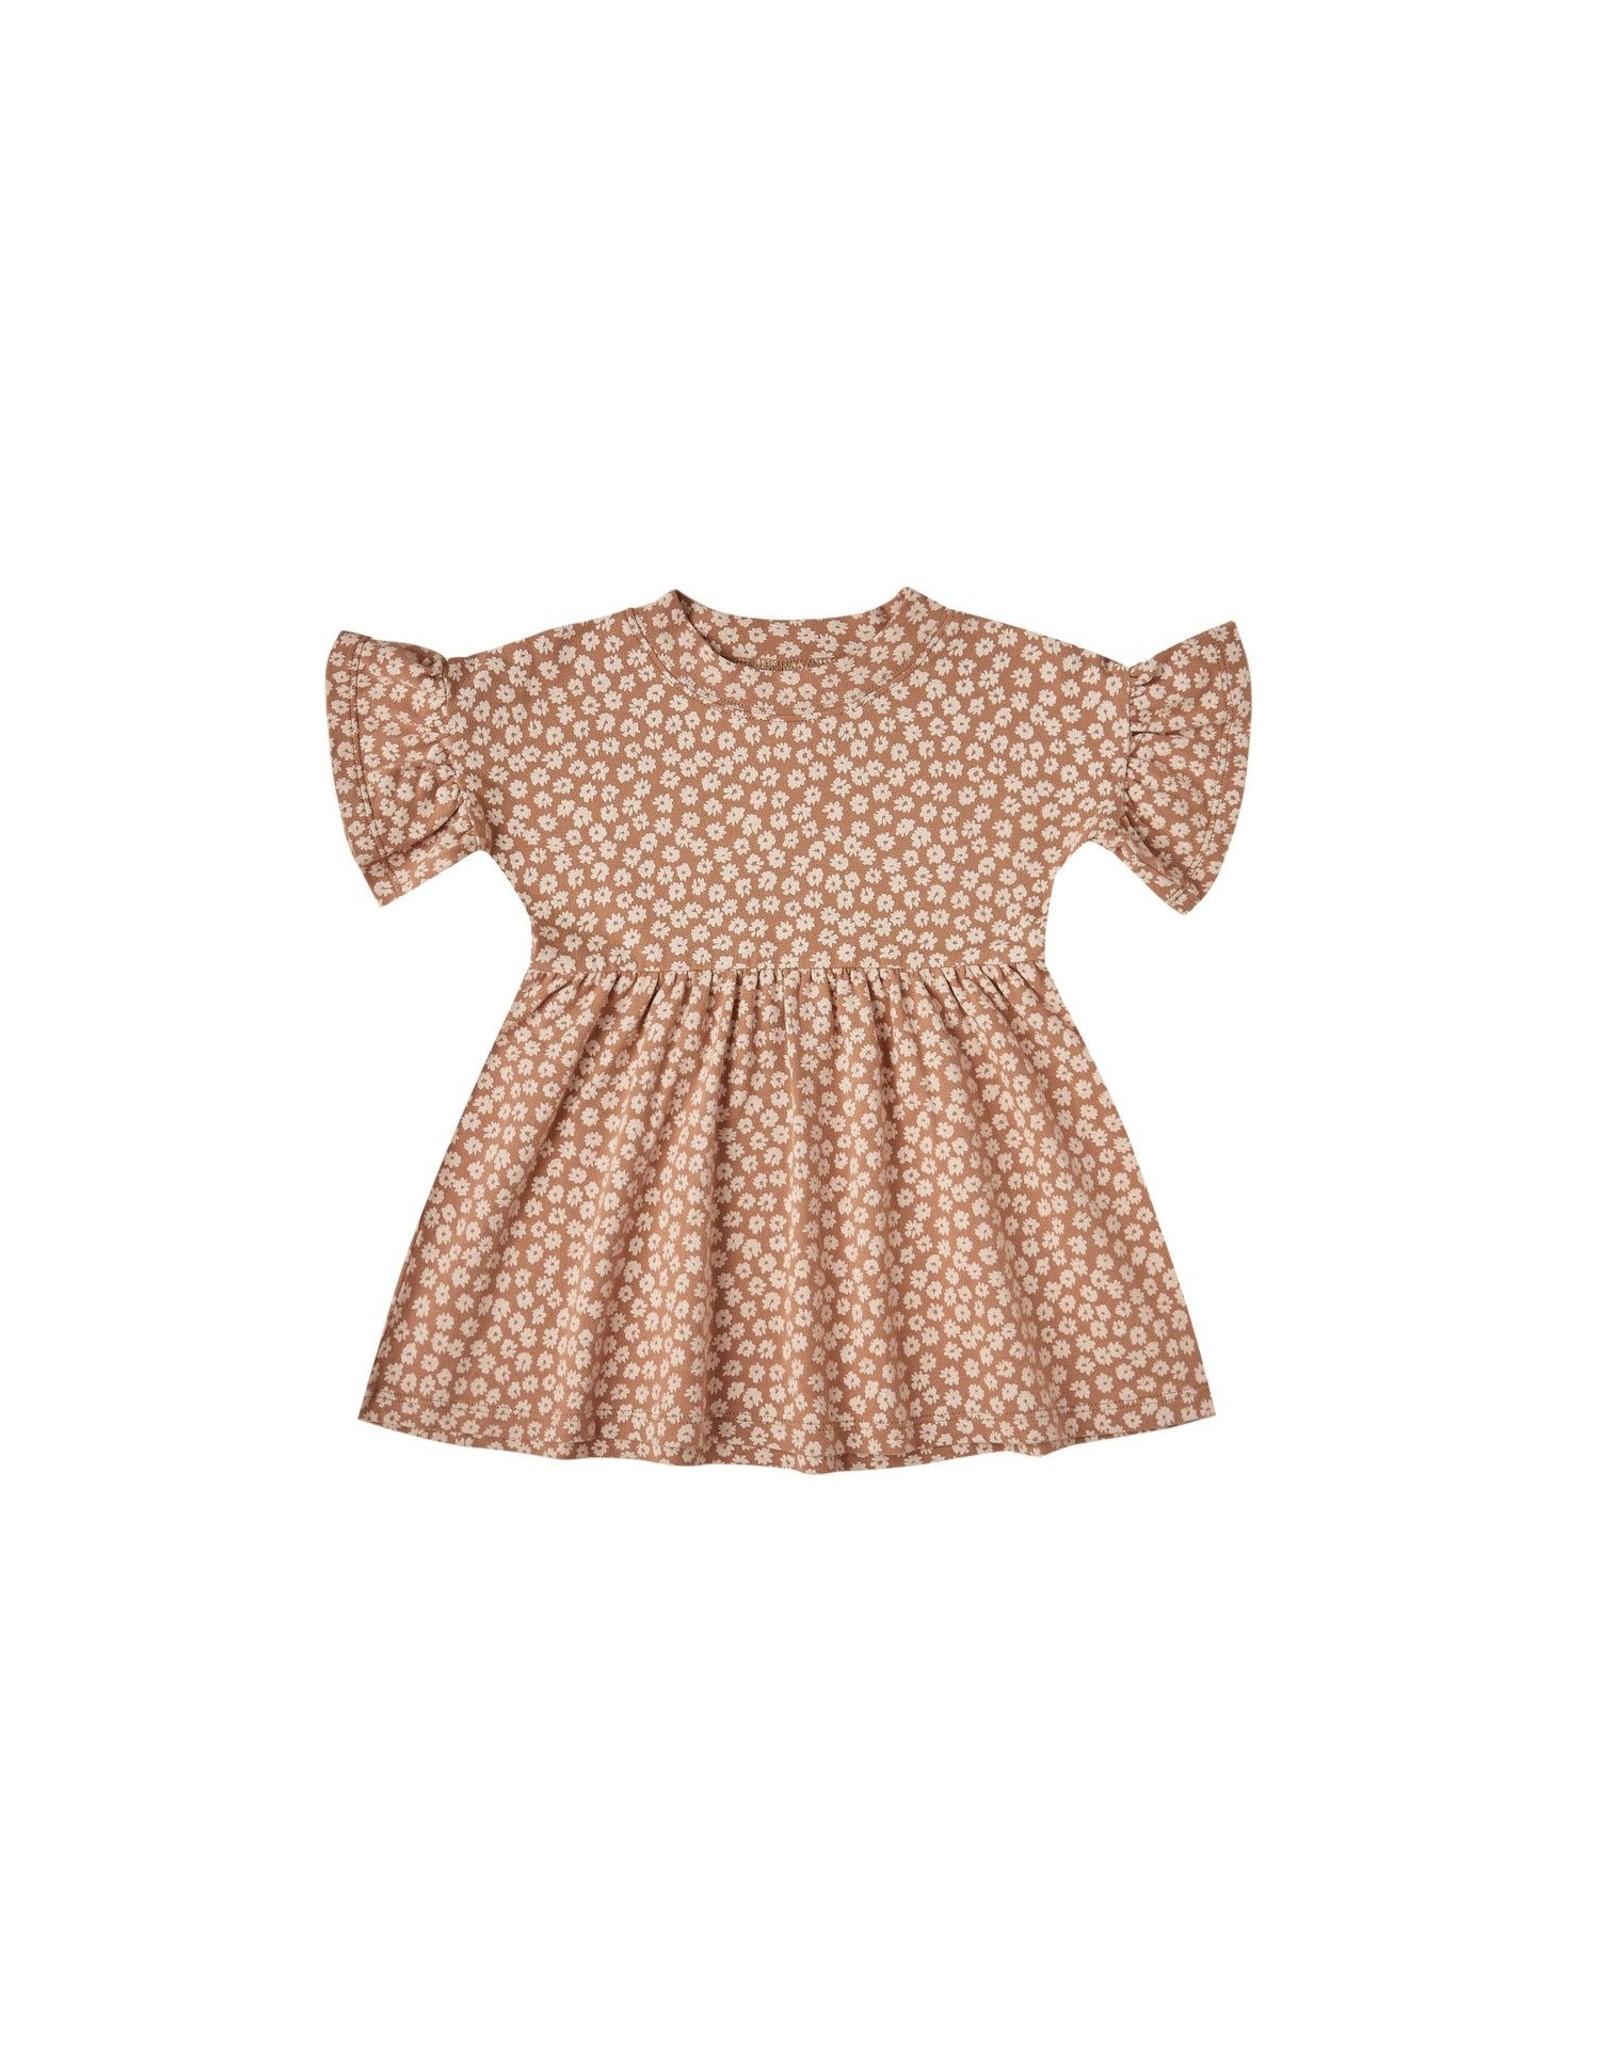 Rylee and Cru ditsy babydoll dress